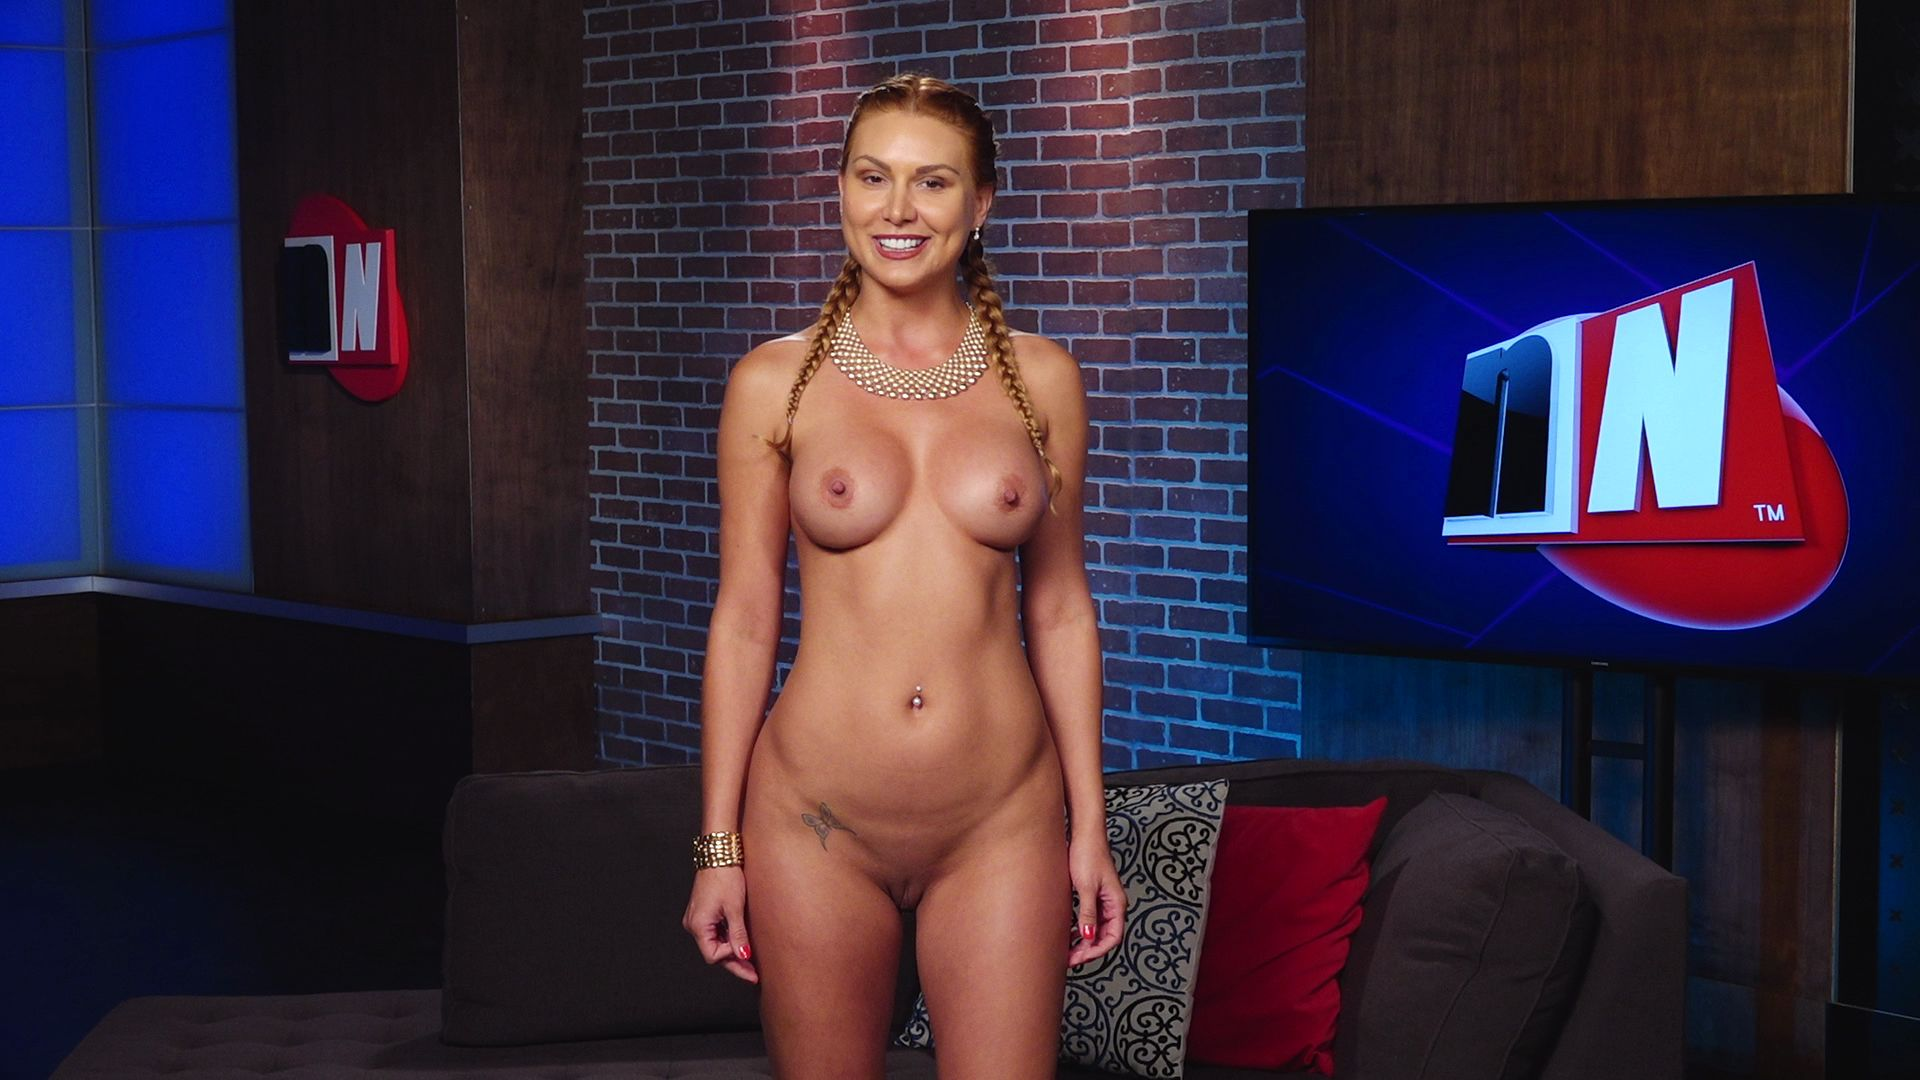 Nude Indian Origin News Anchor